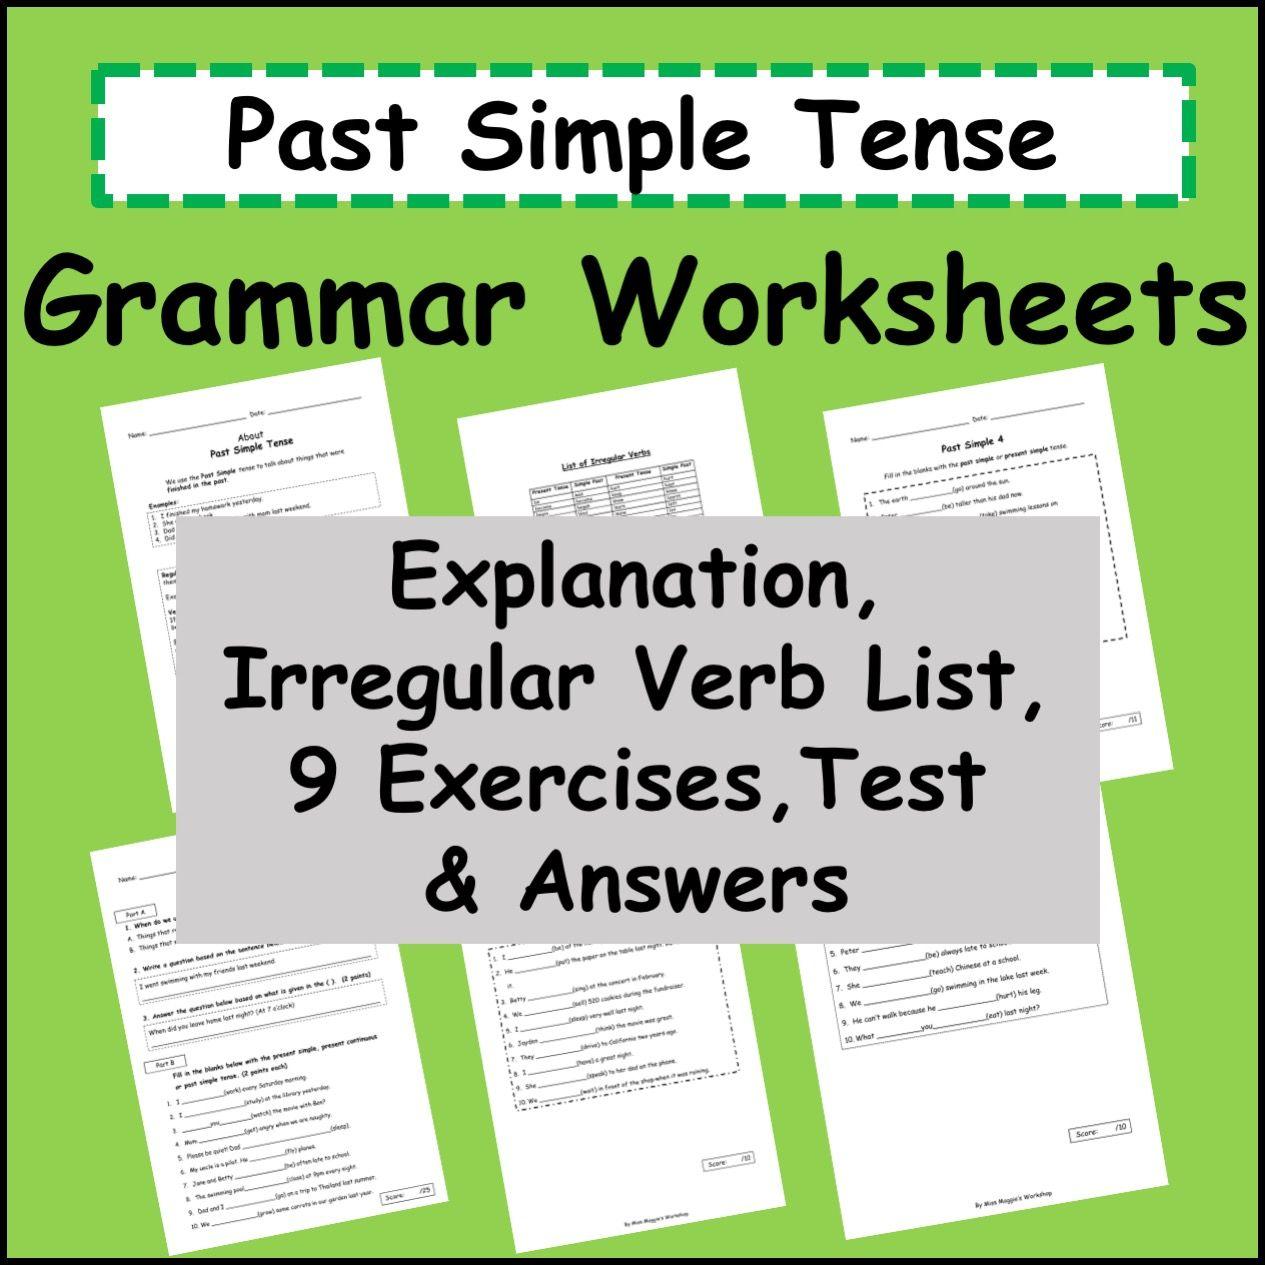 Past Simple Tense Grammar Worksheets For Grade 1 Up Esl Efl Grammar Worksheets Tenses Grammar 1st Grade Worksheets [ 1265 x 1265 Pixel ]